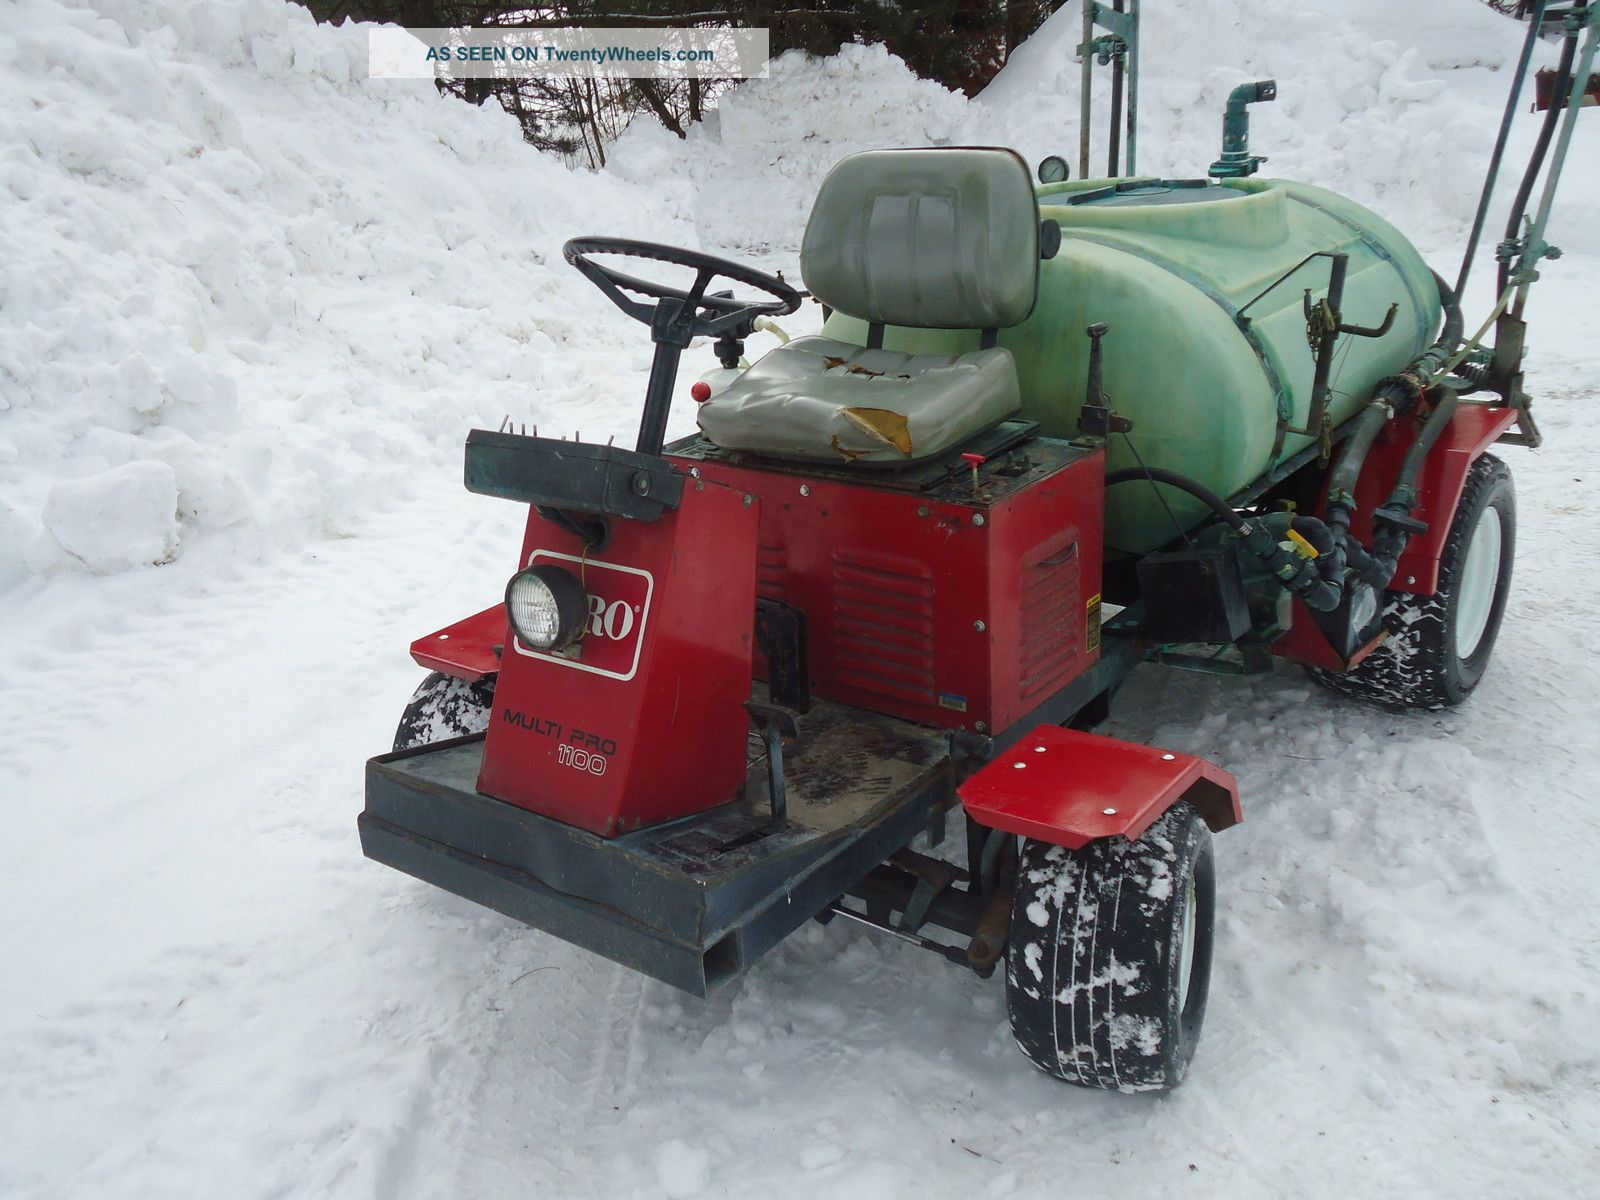 Toro Multi Pro 1100 Sprayer Utility Vehicles photo